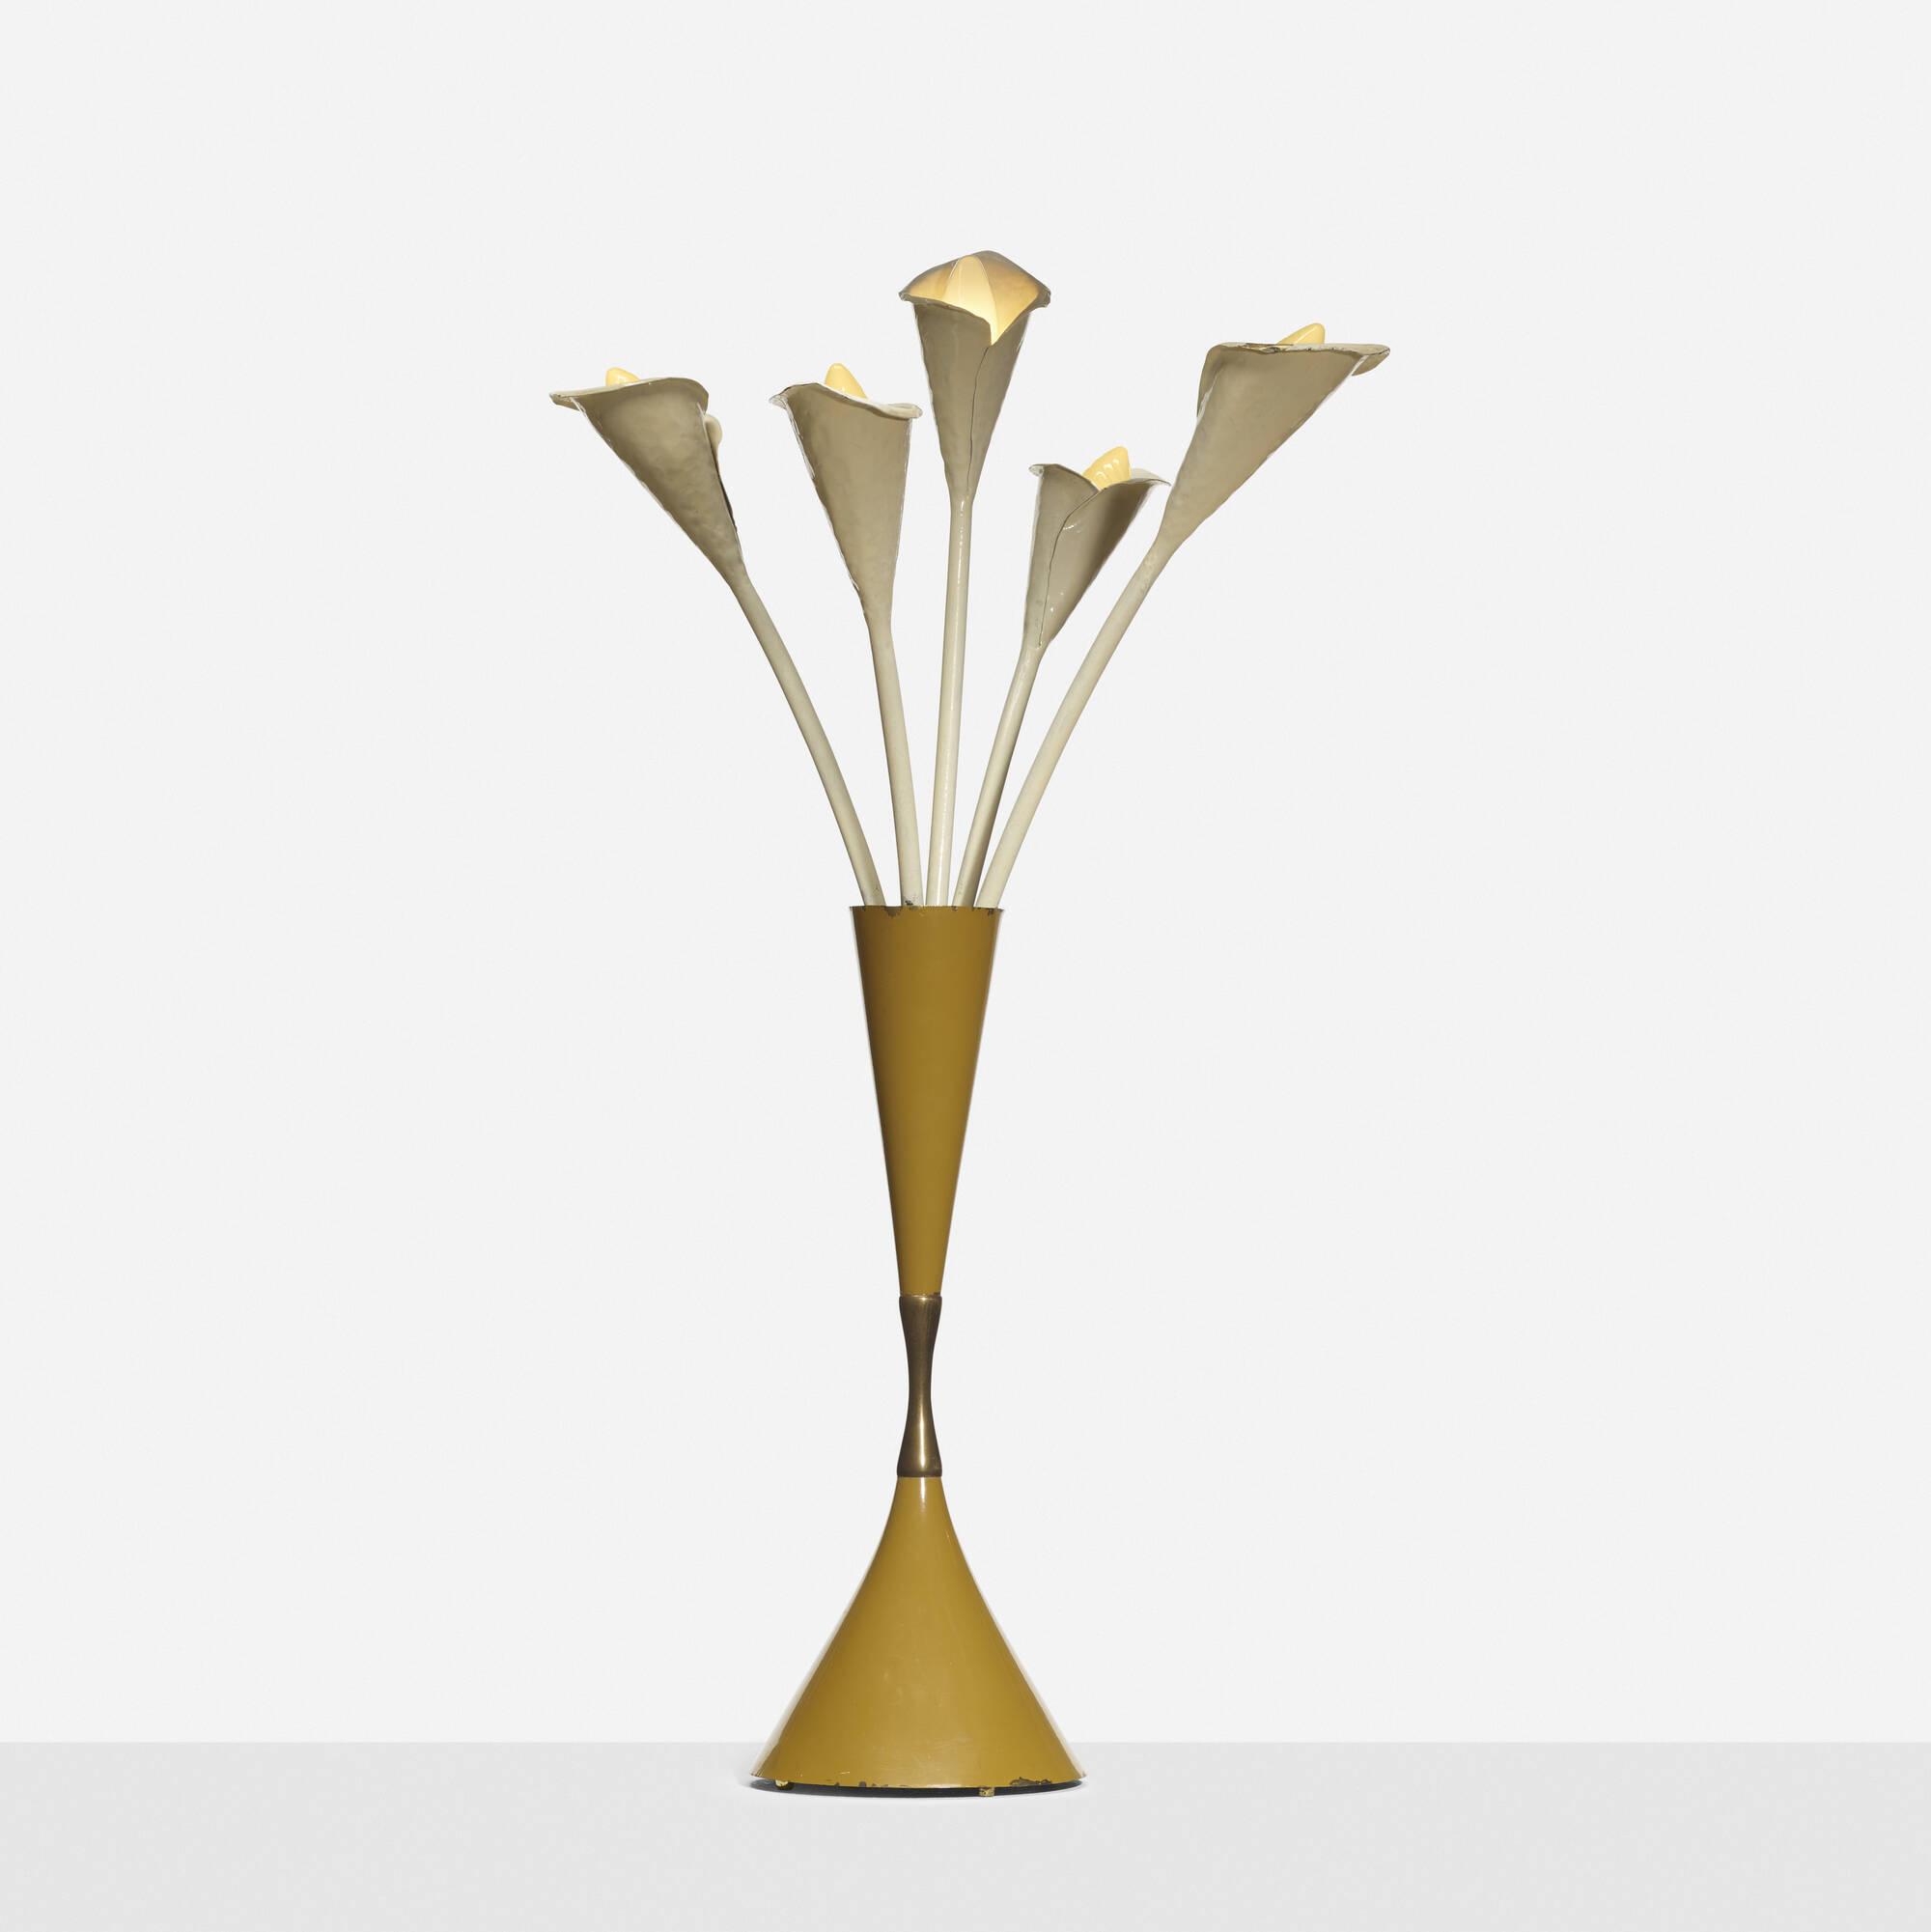 201: Angelo Lelii / Calla table lamp (1 of 1)